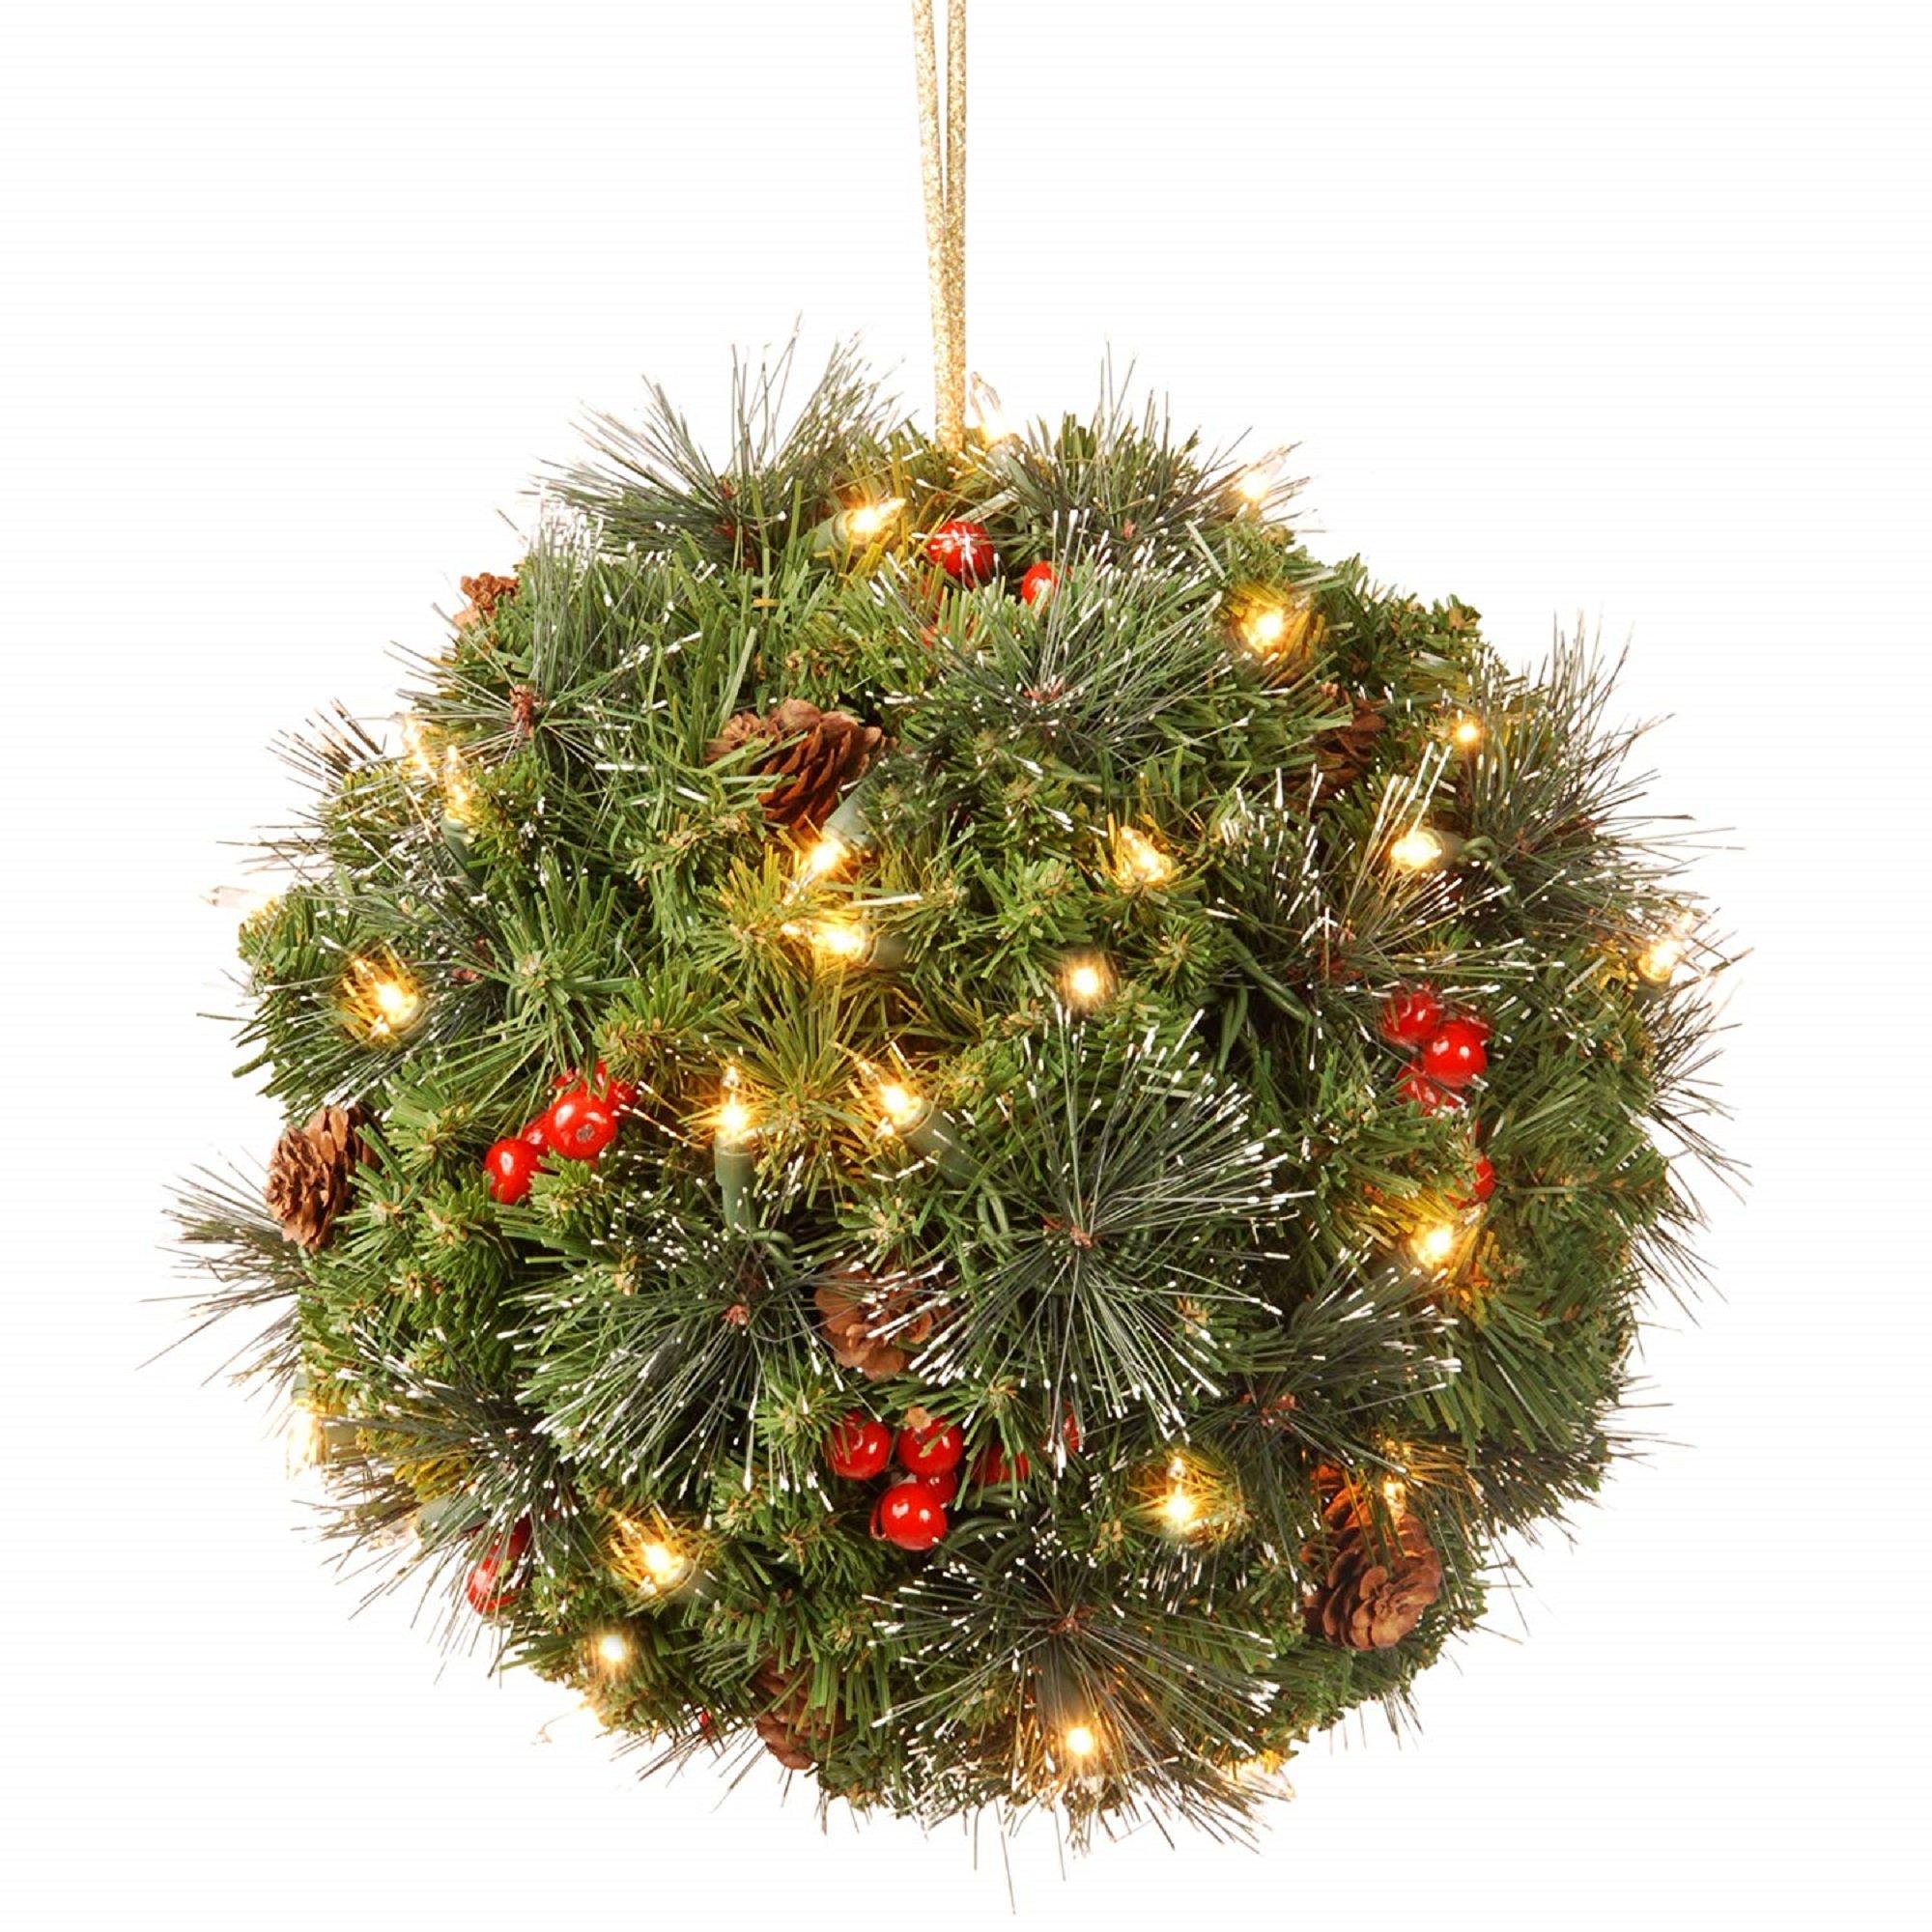 16'' Pre-lit Crestwood Spruce Kissing Ball Christmas Ornament - Warm White LED Lights/BO